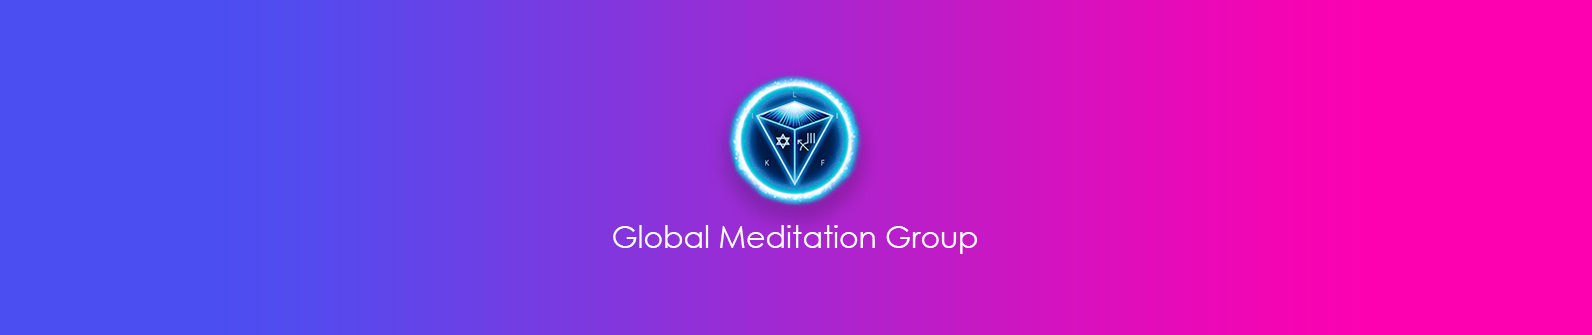 Global Meditation Group